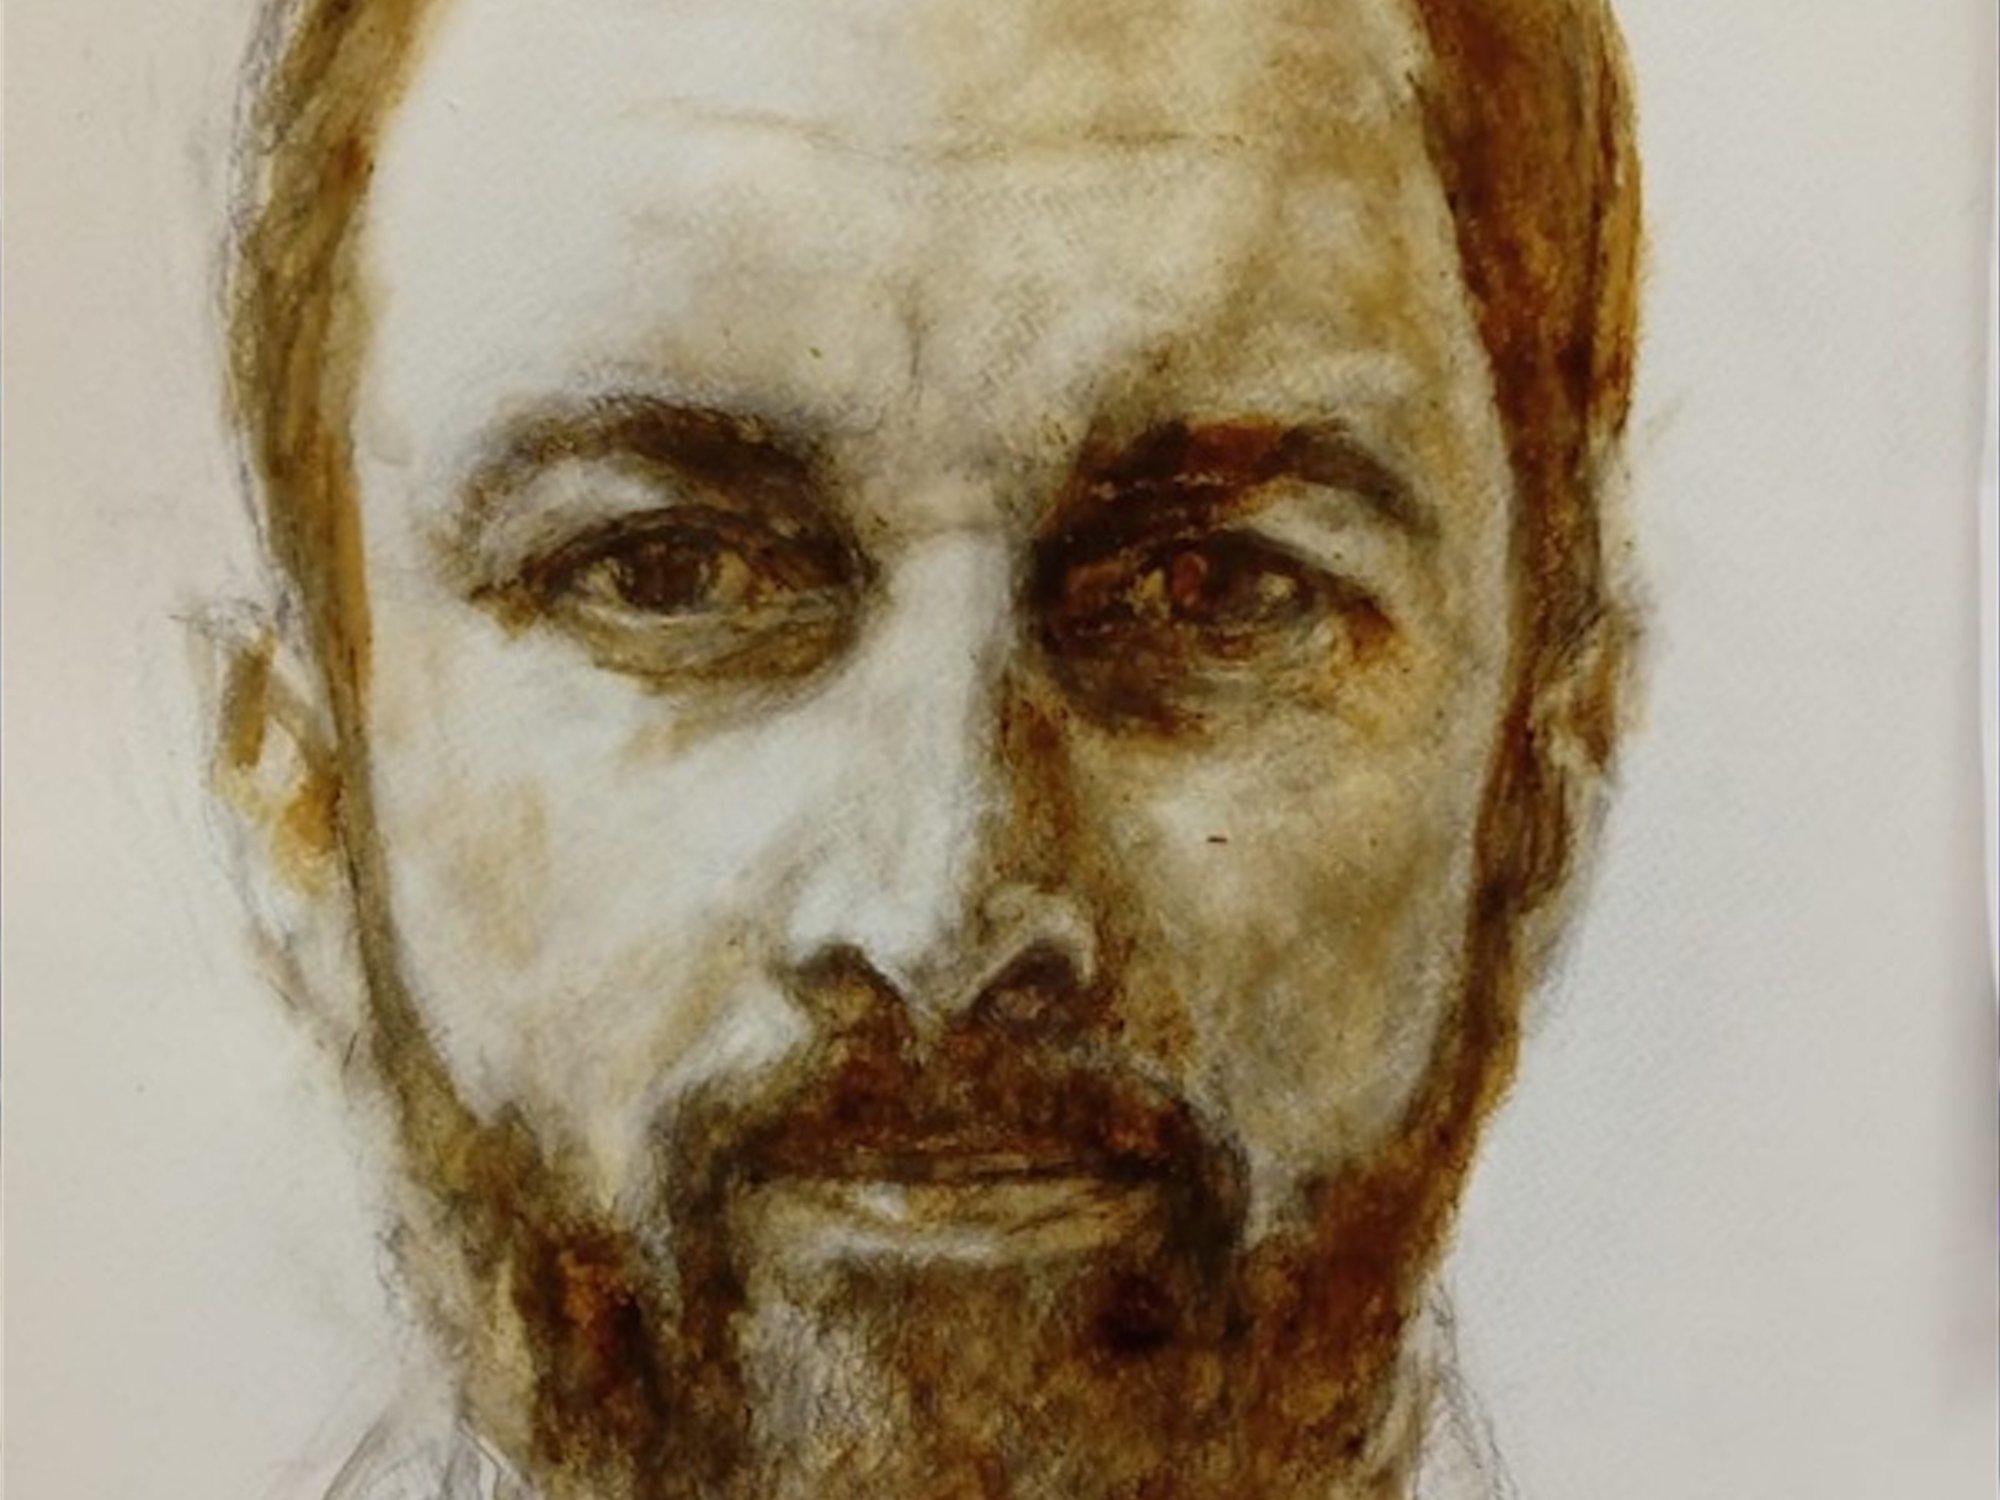 Un artista madrileño retrata con su propios excrementos a Santiago Abascal